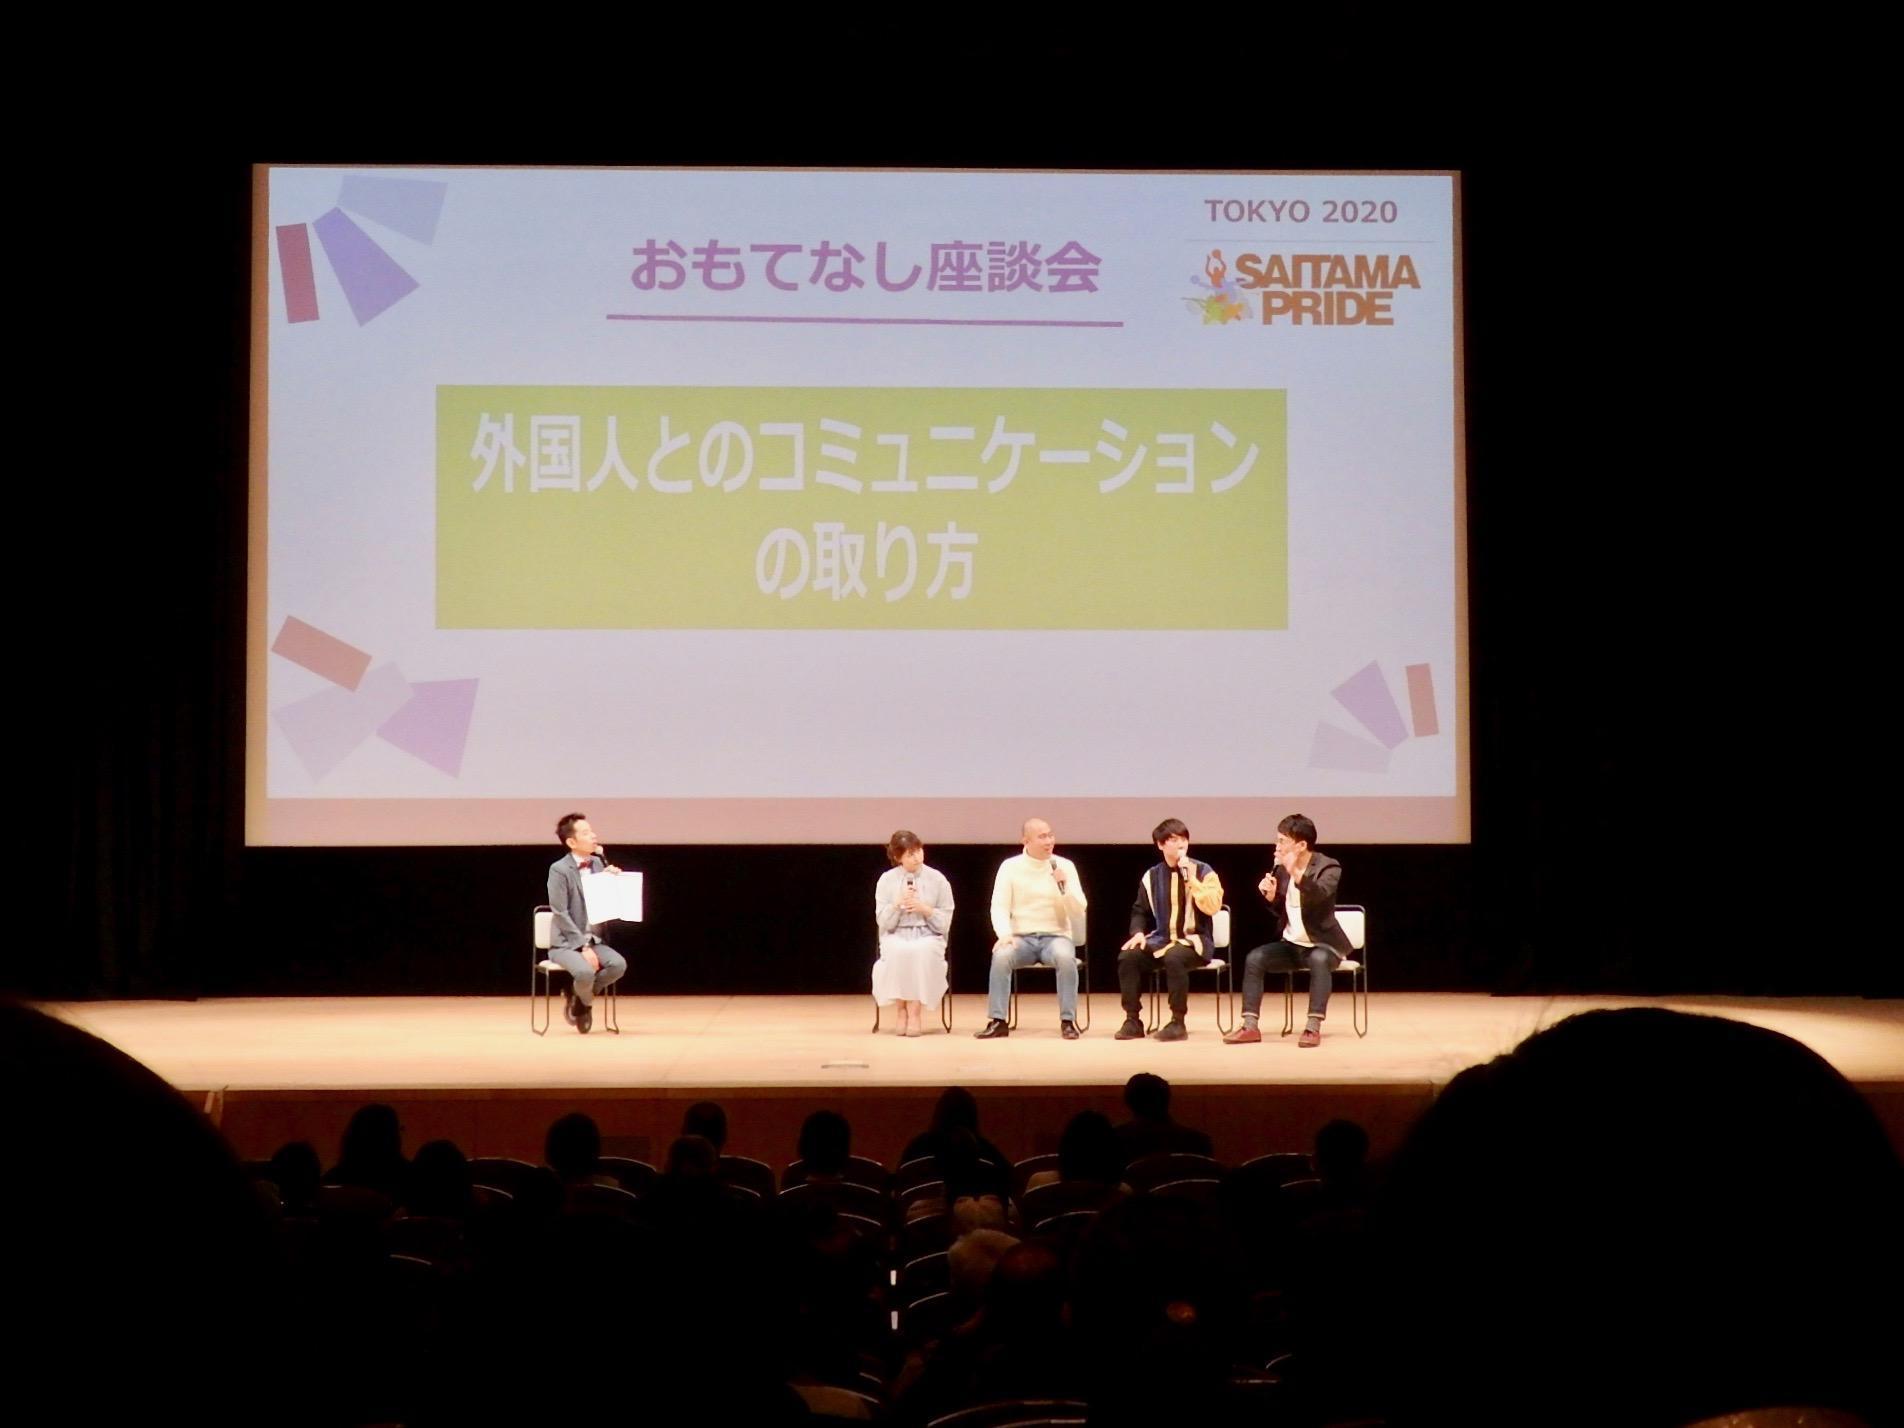 http://news.yoshimoto.co.jp/20190203175719-4ae3fdd133b730c5d0ecd40a9829b254c324cda1.jpeg